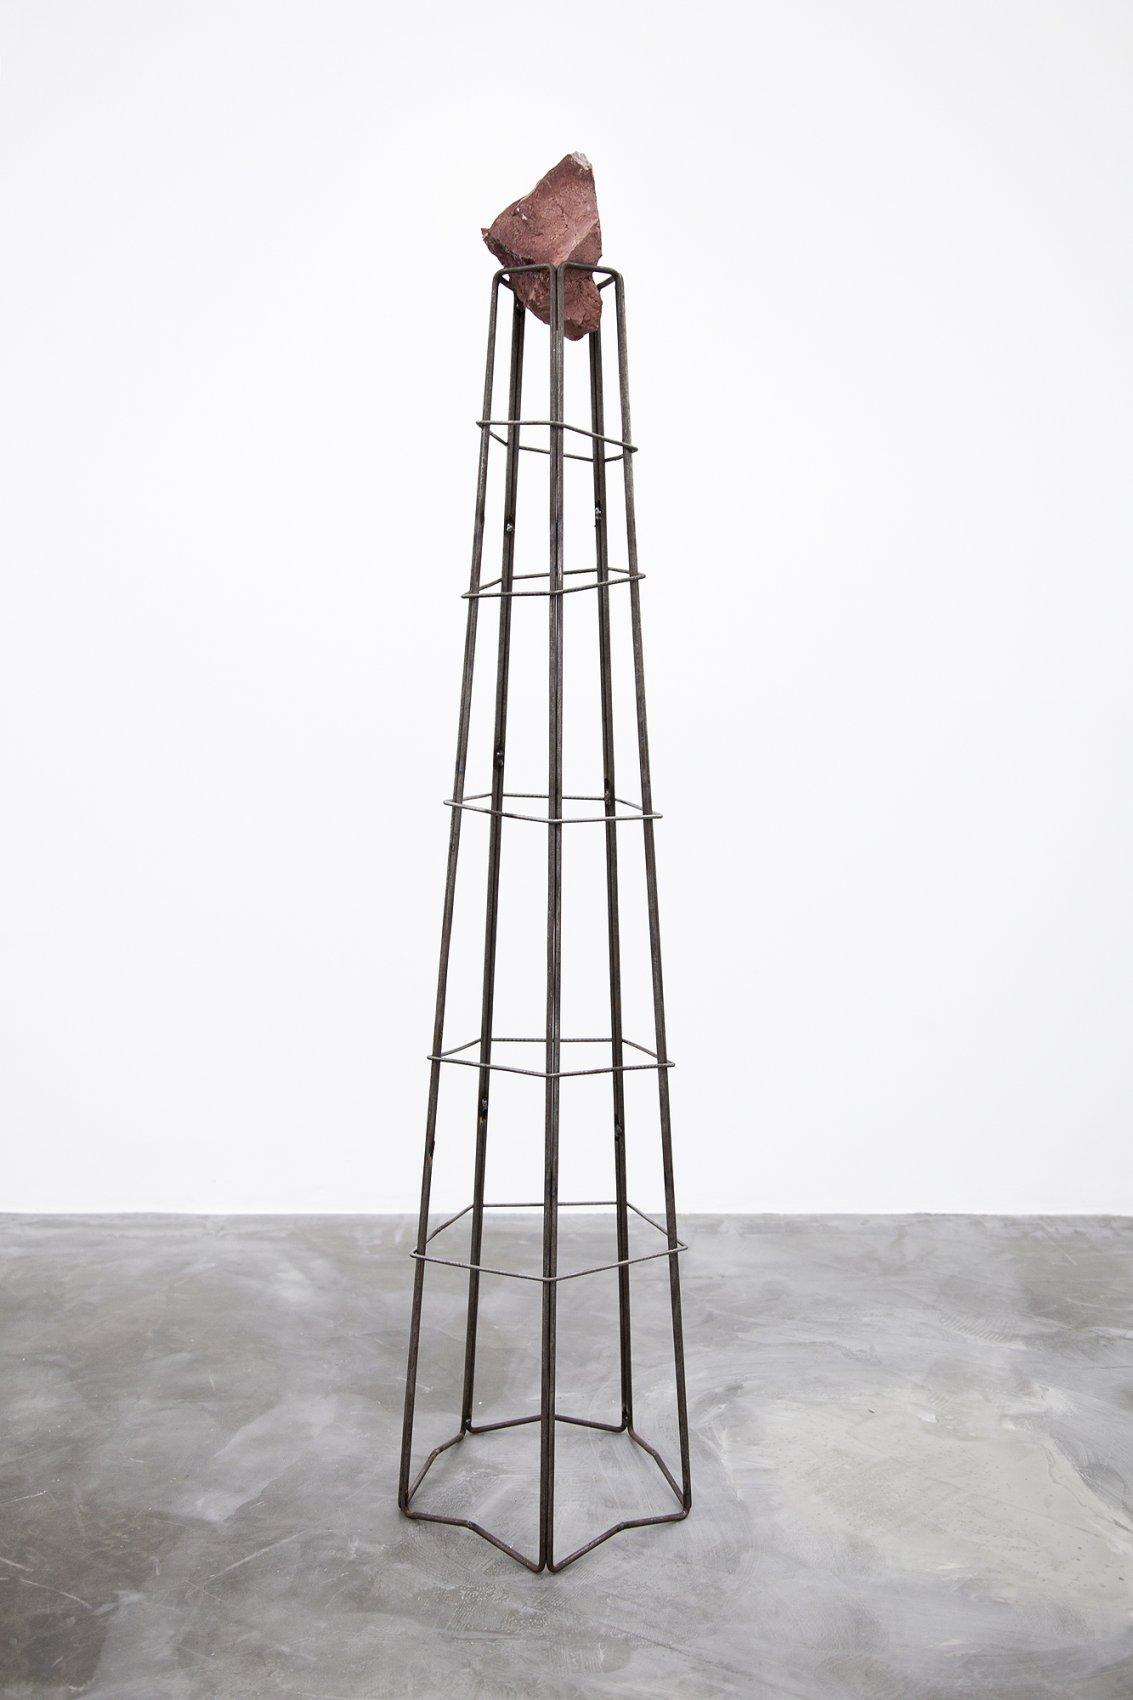 Coração seguro (2016) - Raquel Versieux